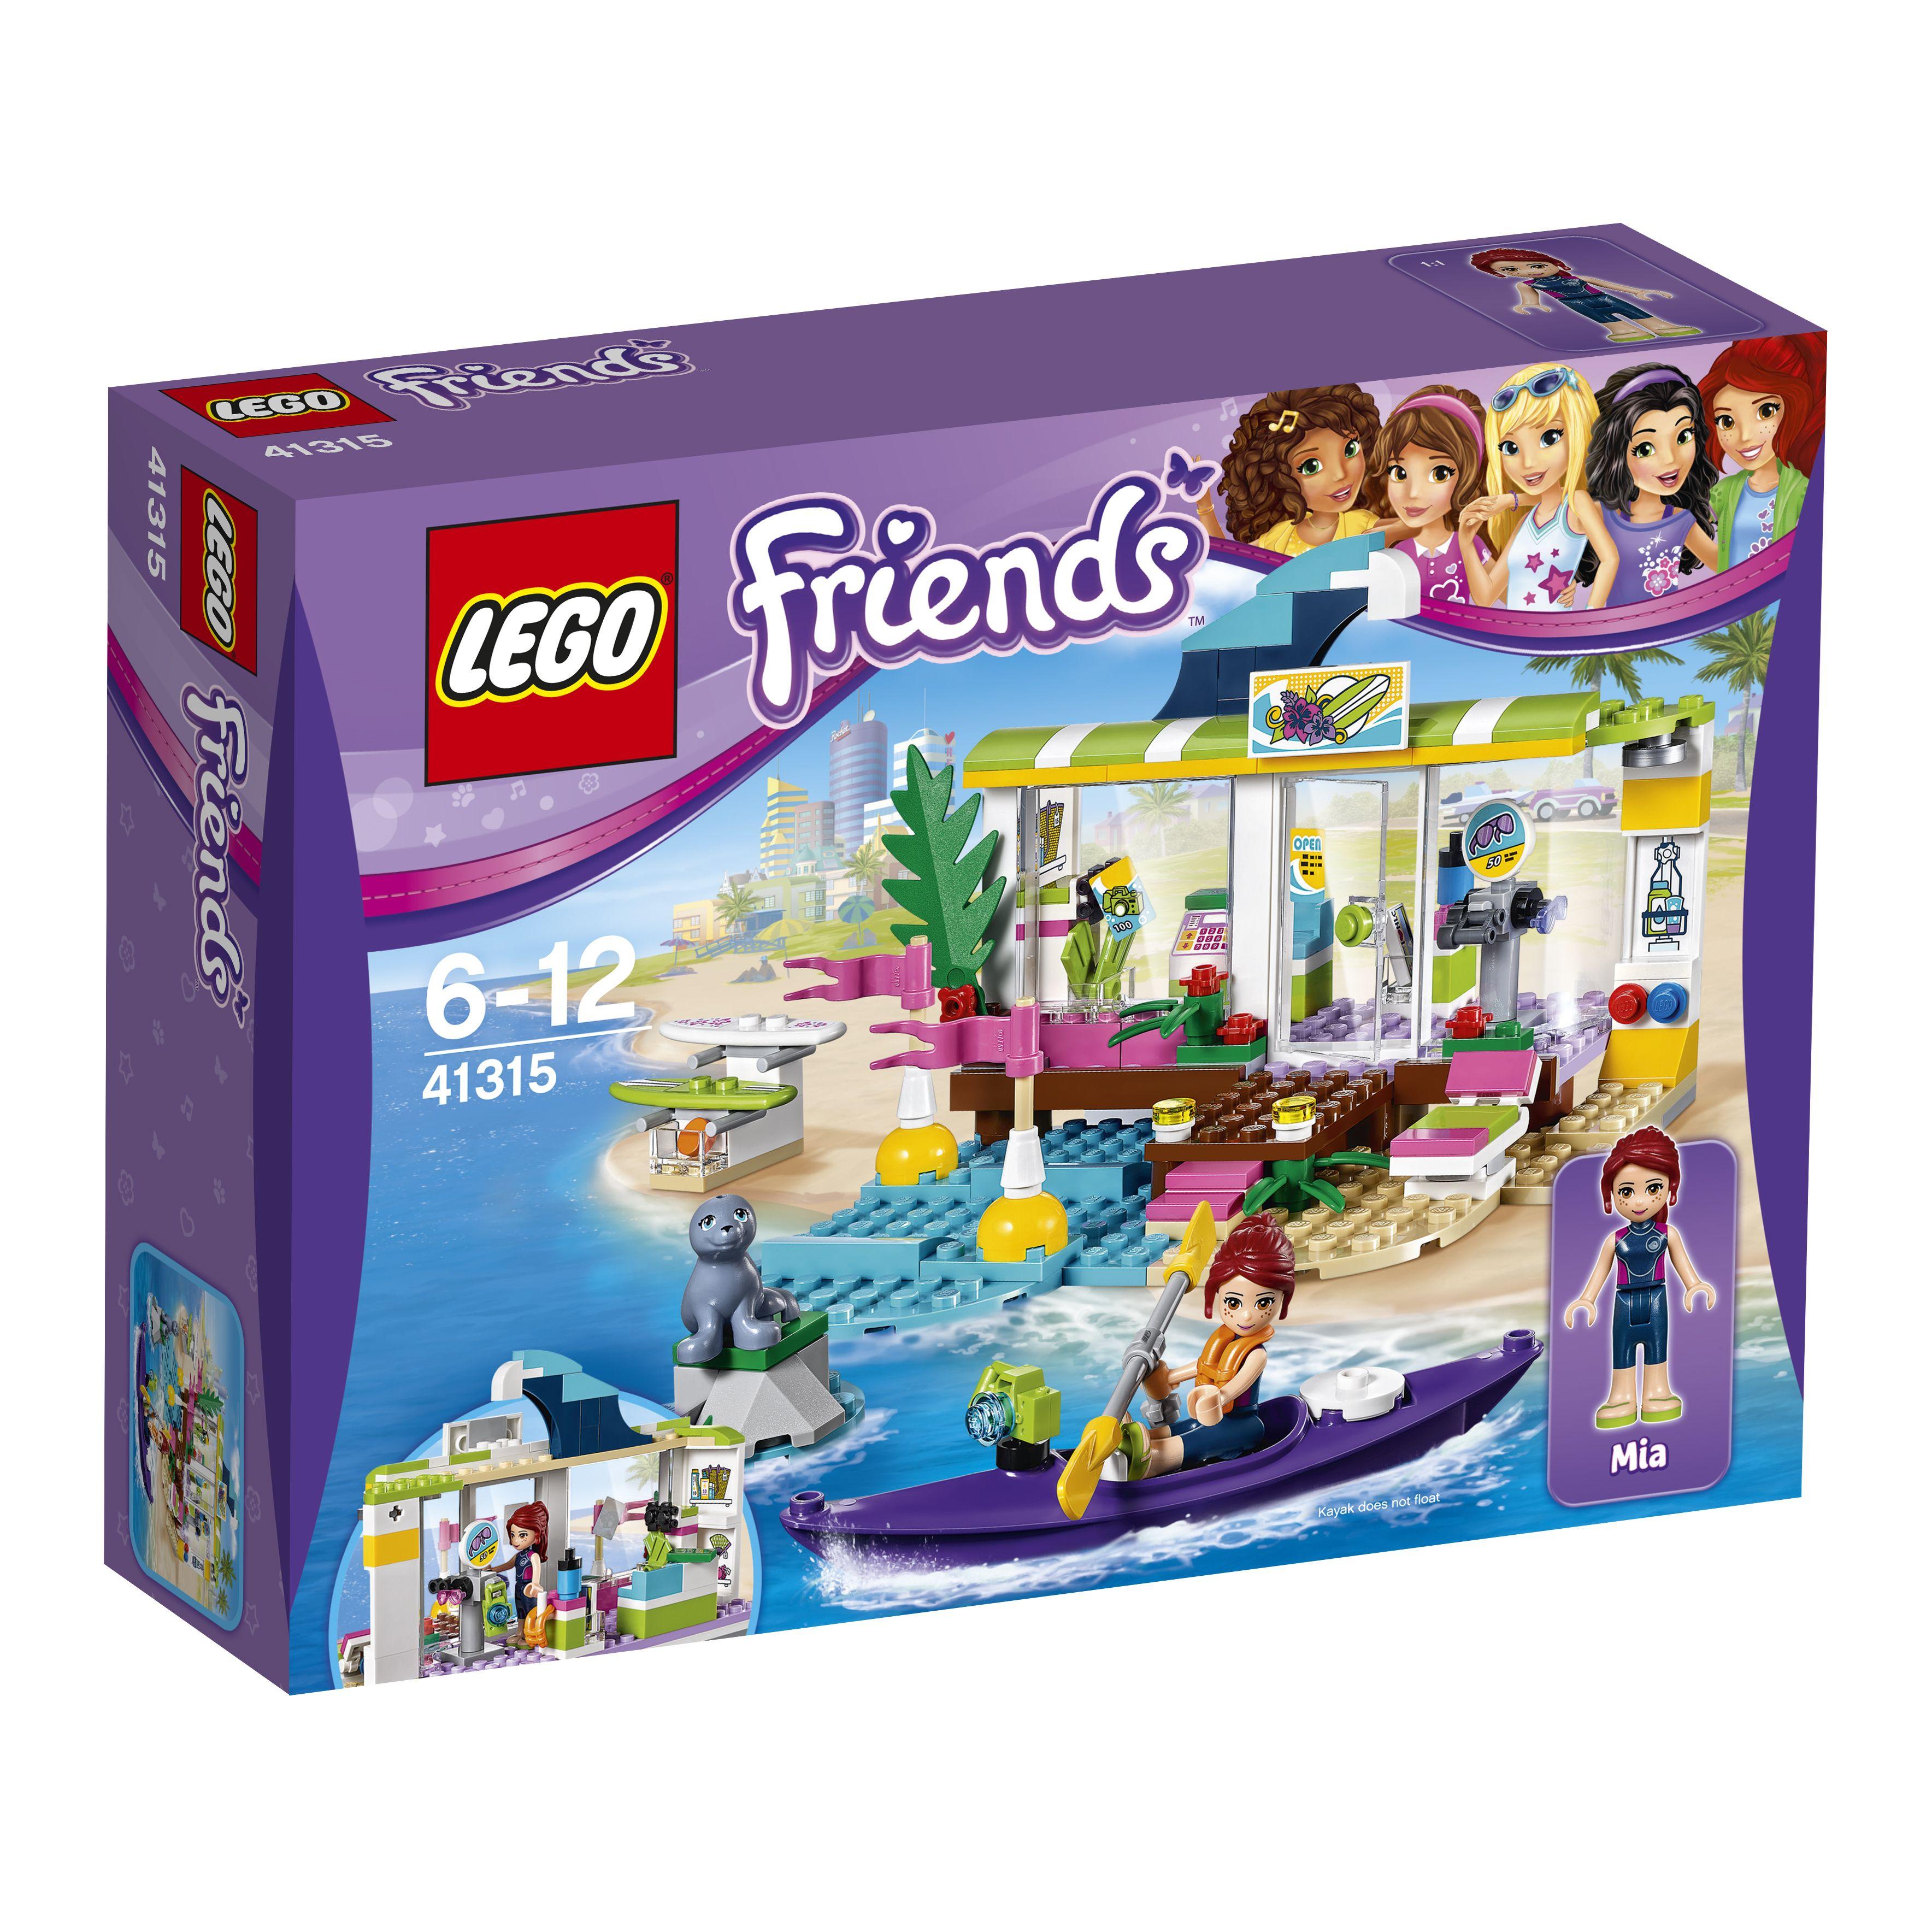 Aeroporto Lego : Lego lego lego friends heartlake surfladen alter